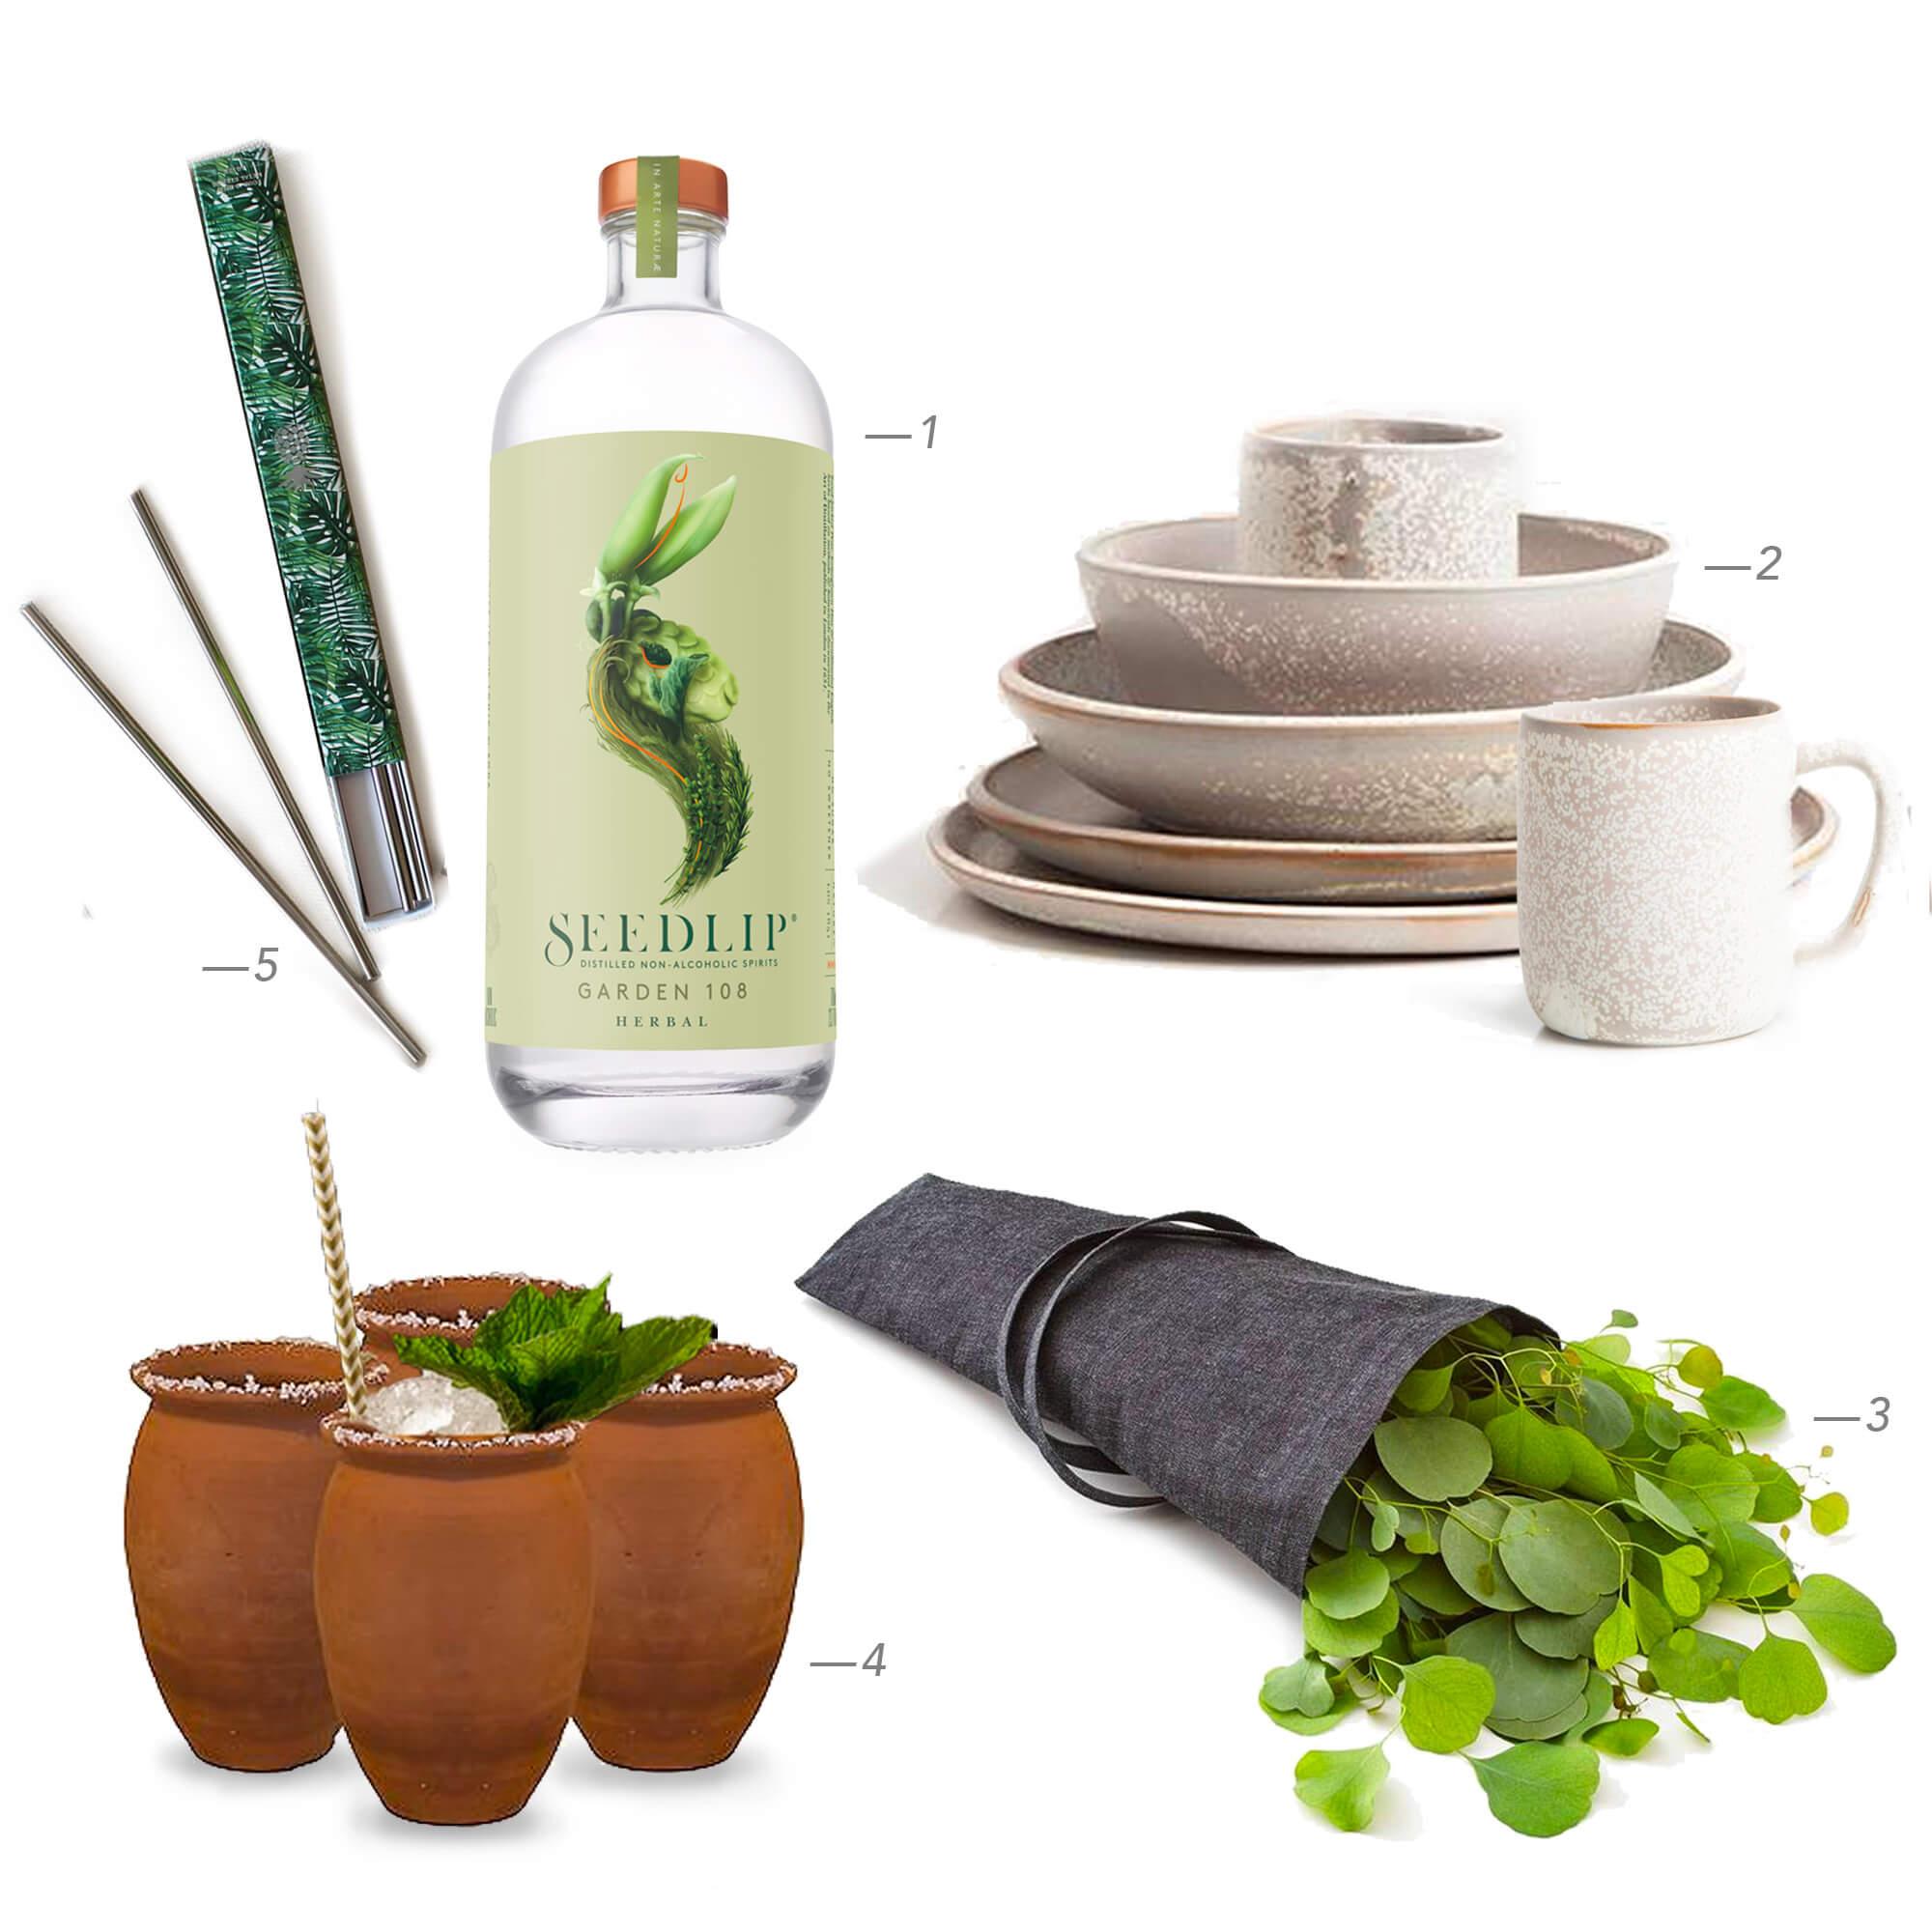 1 —  Seedlip non-alcoholic herbal spirits ($36  Seedlip )  2 —  Handmade Moon ceramics ($40+  Luv Haus )  3 —  Jardin reusable flower garden tote ($40  Aplat )  4 —  Cantarito Pot cocktail cups ($8  Grant Bros )  5 —  Pineapple Co. metals straws ($8  W&P )